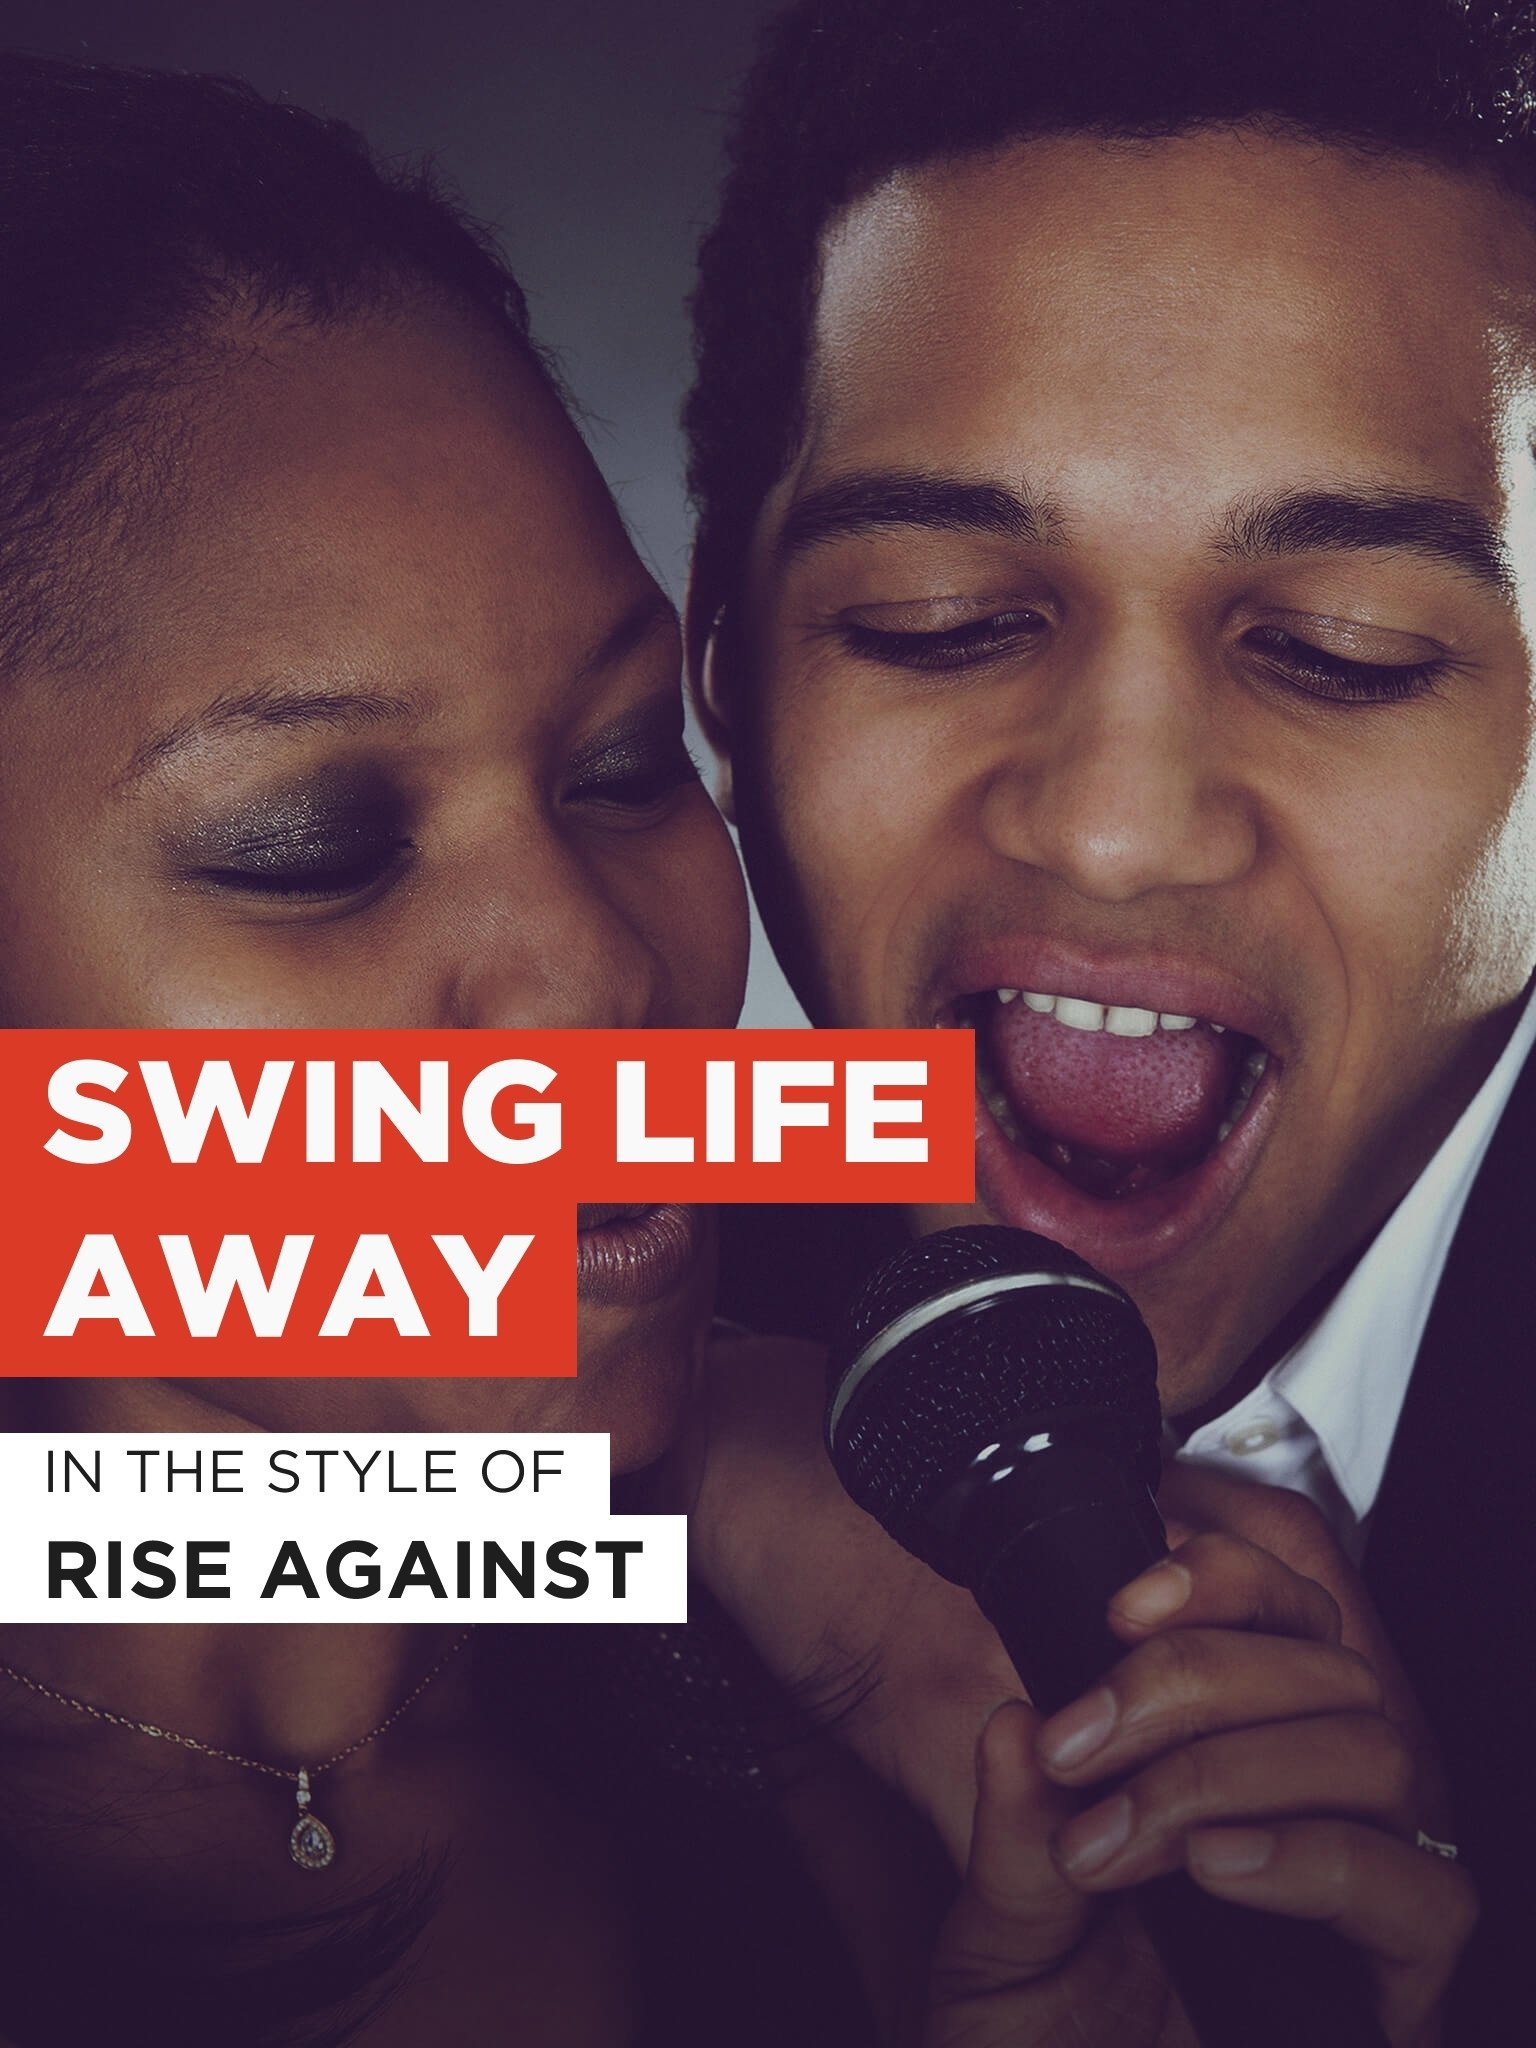 Swing life styles